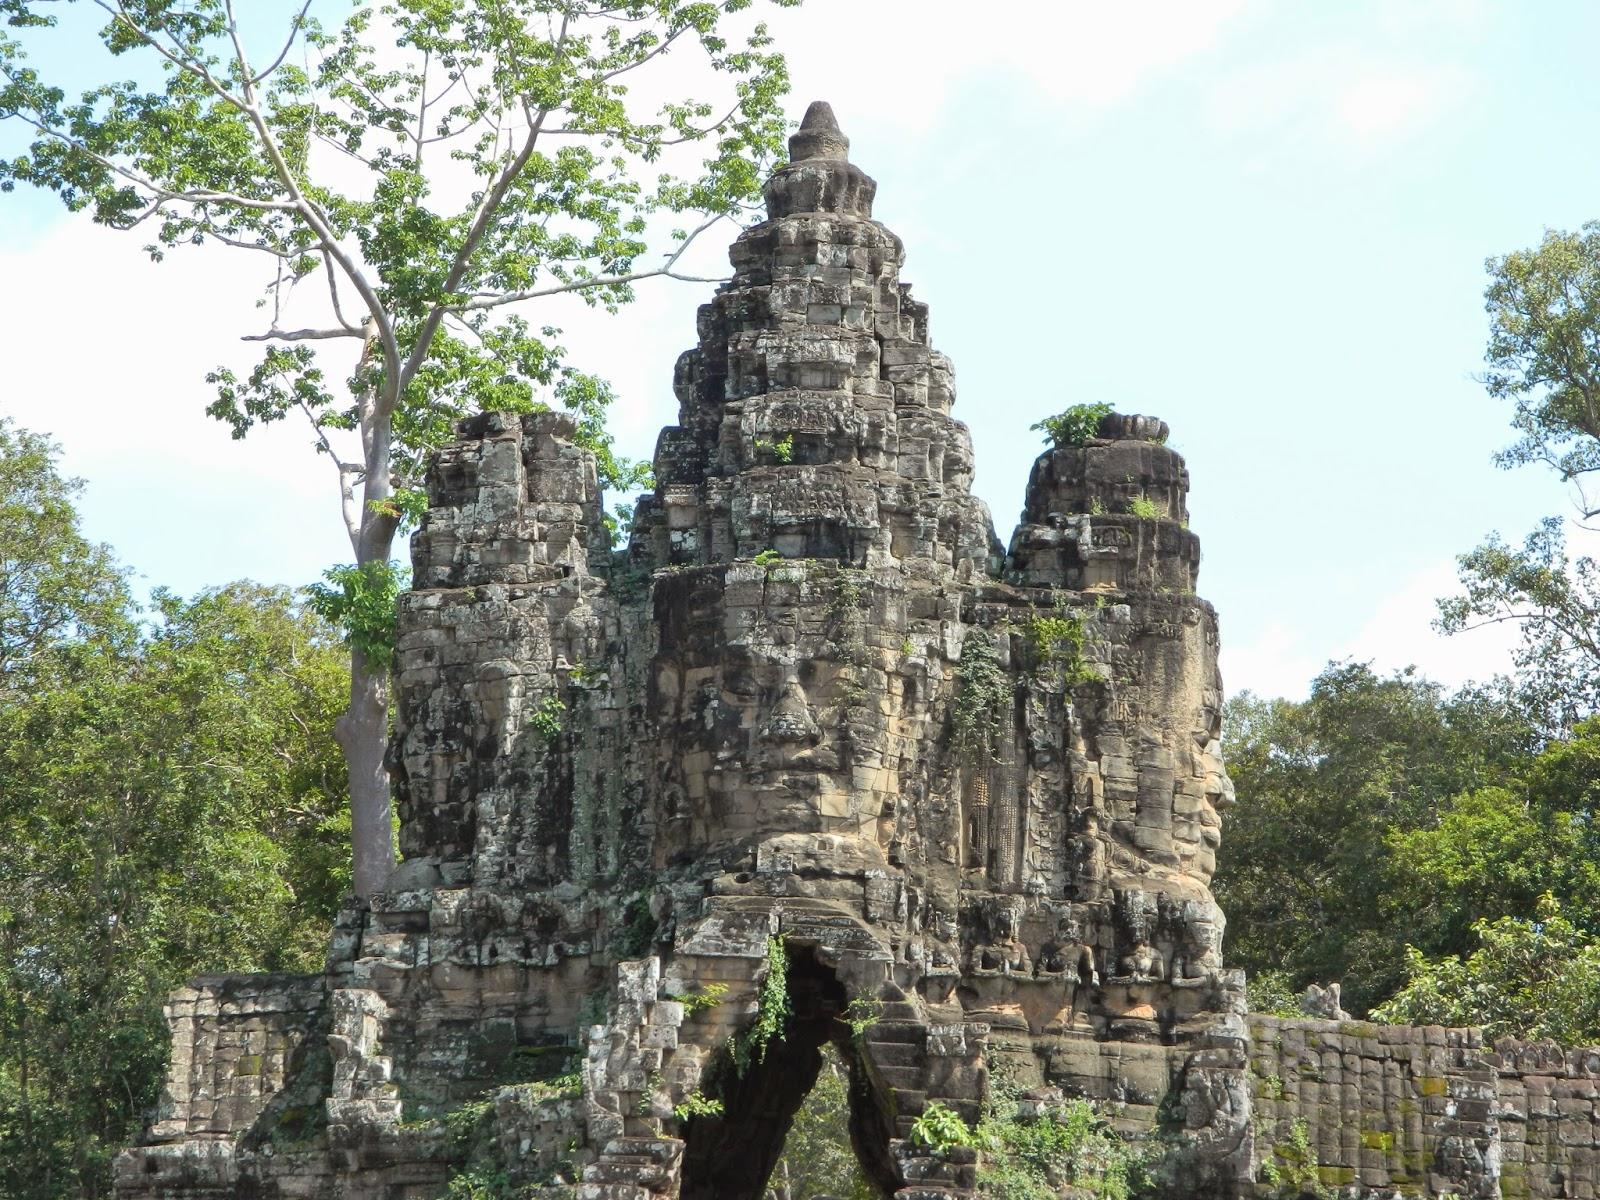 Entrance to the Bayon Temple